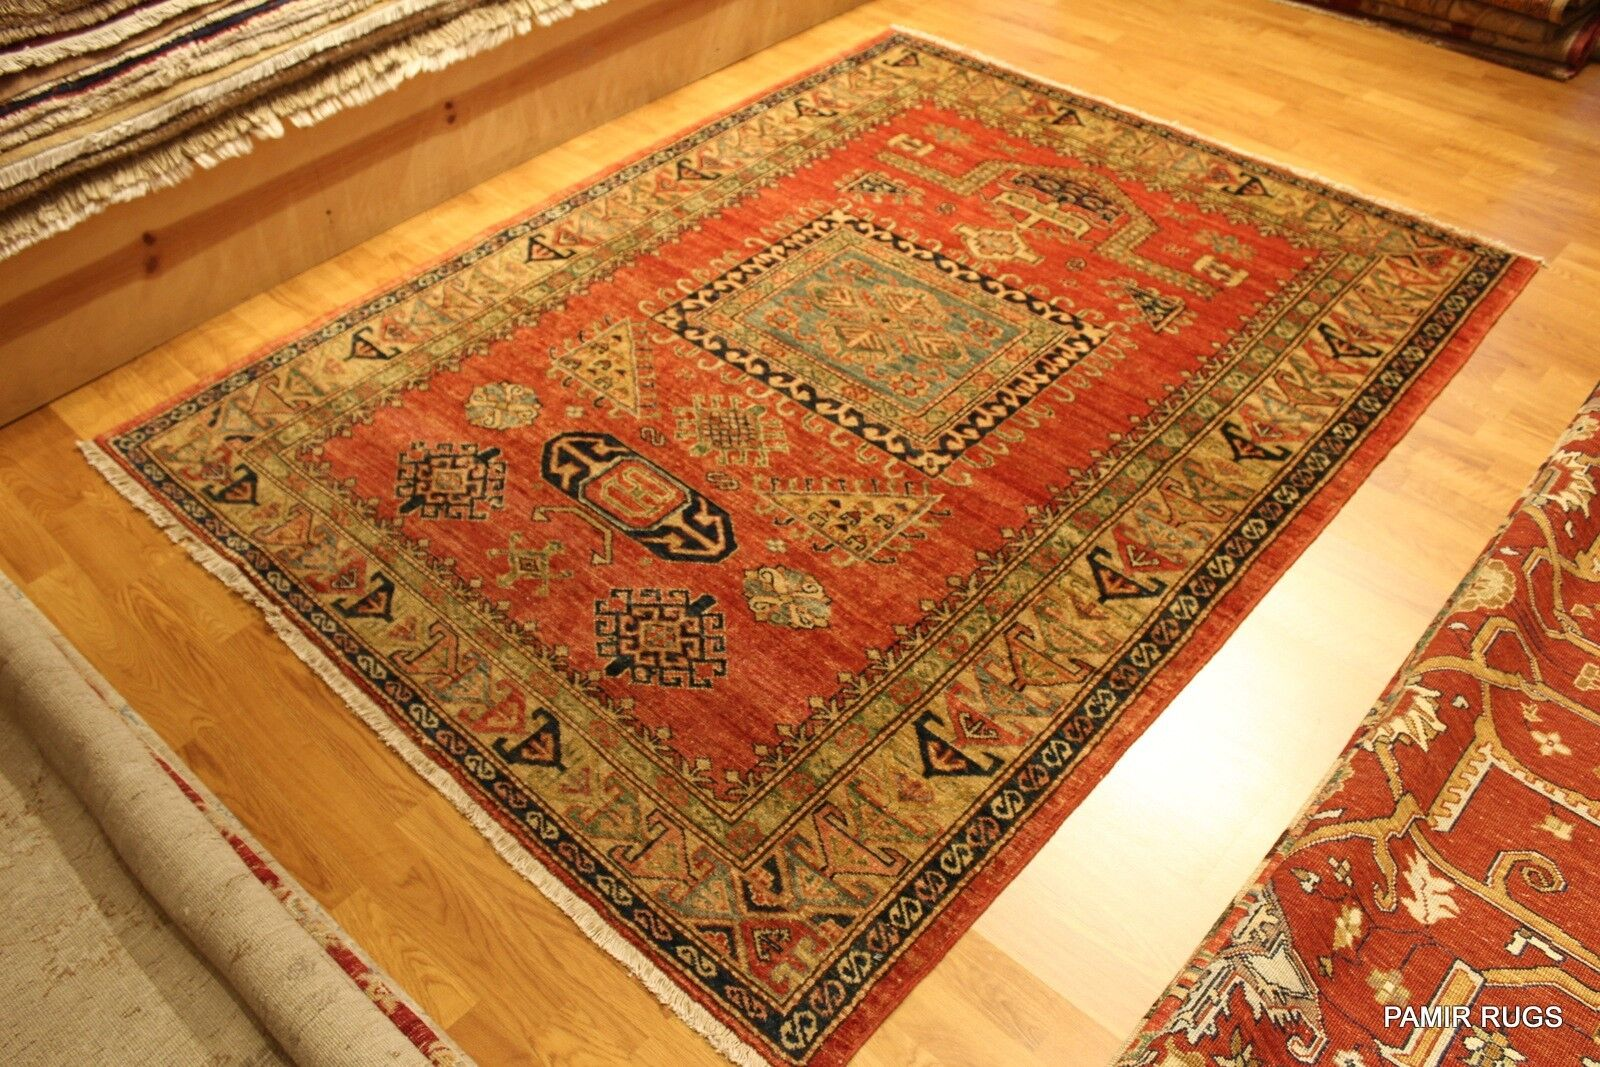 Handmade Fine Quality Caucasian Kazak Design Antique Washed 5 X 7 Prayer Rug